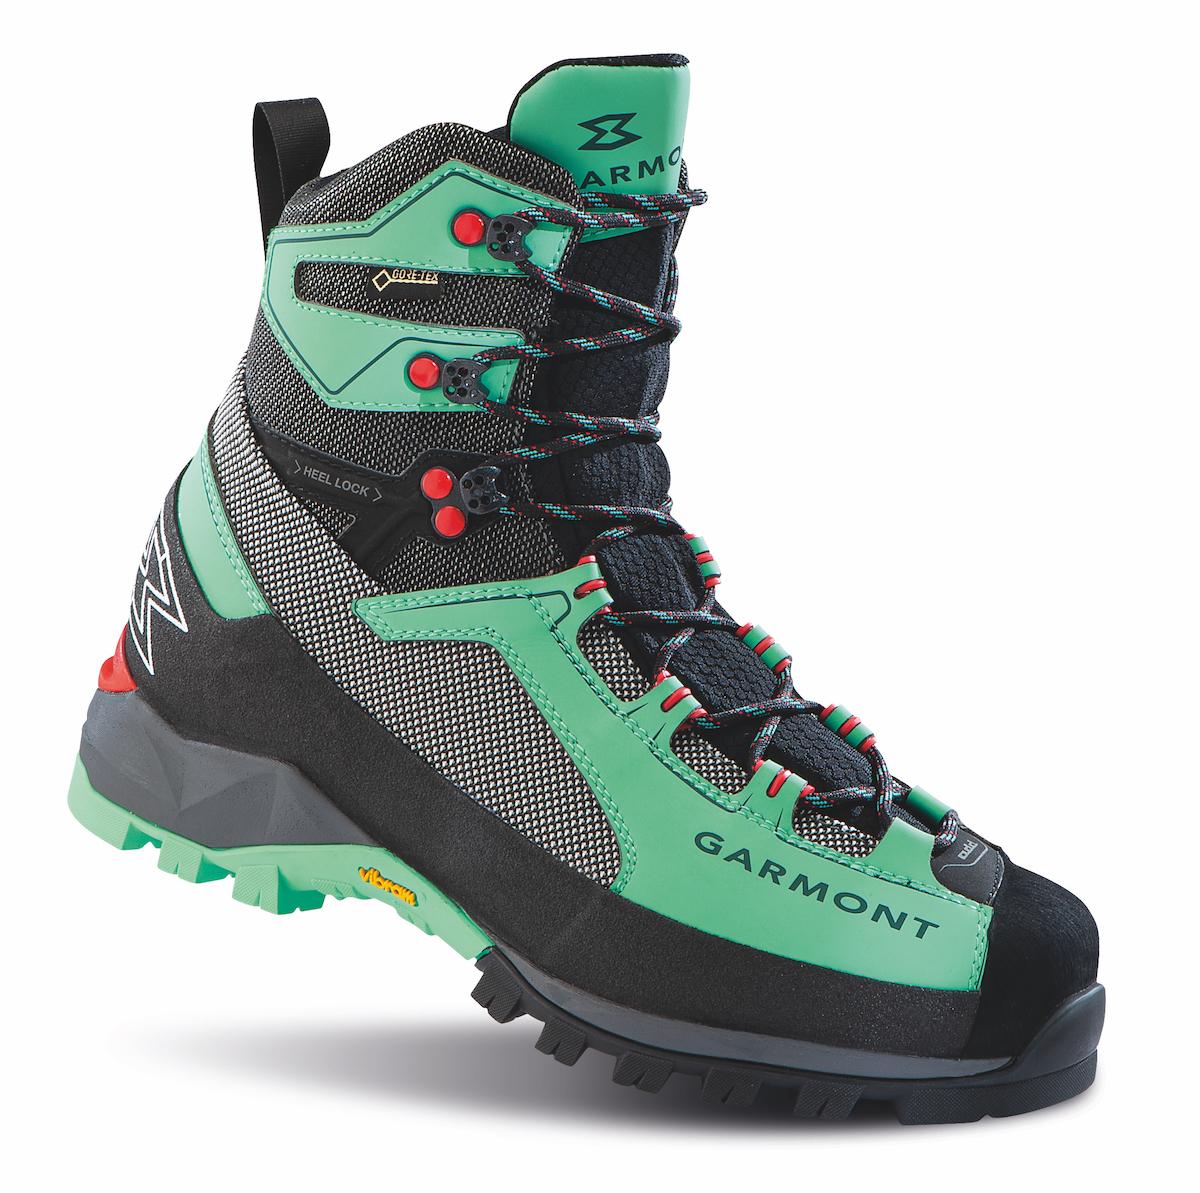 Garmont Tower 2.0 GTX - Chaussures alpinisme femme